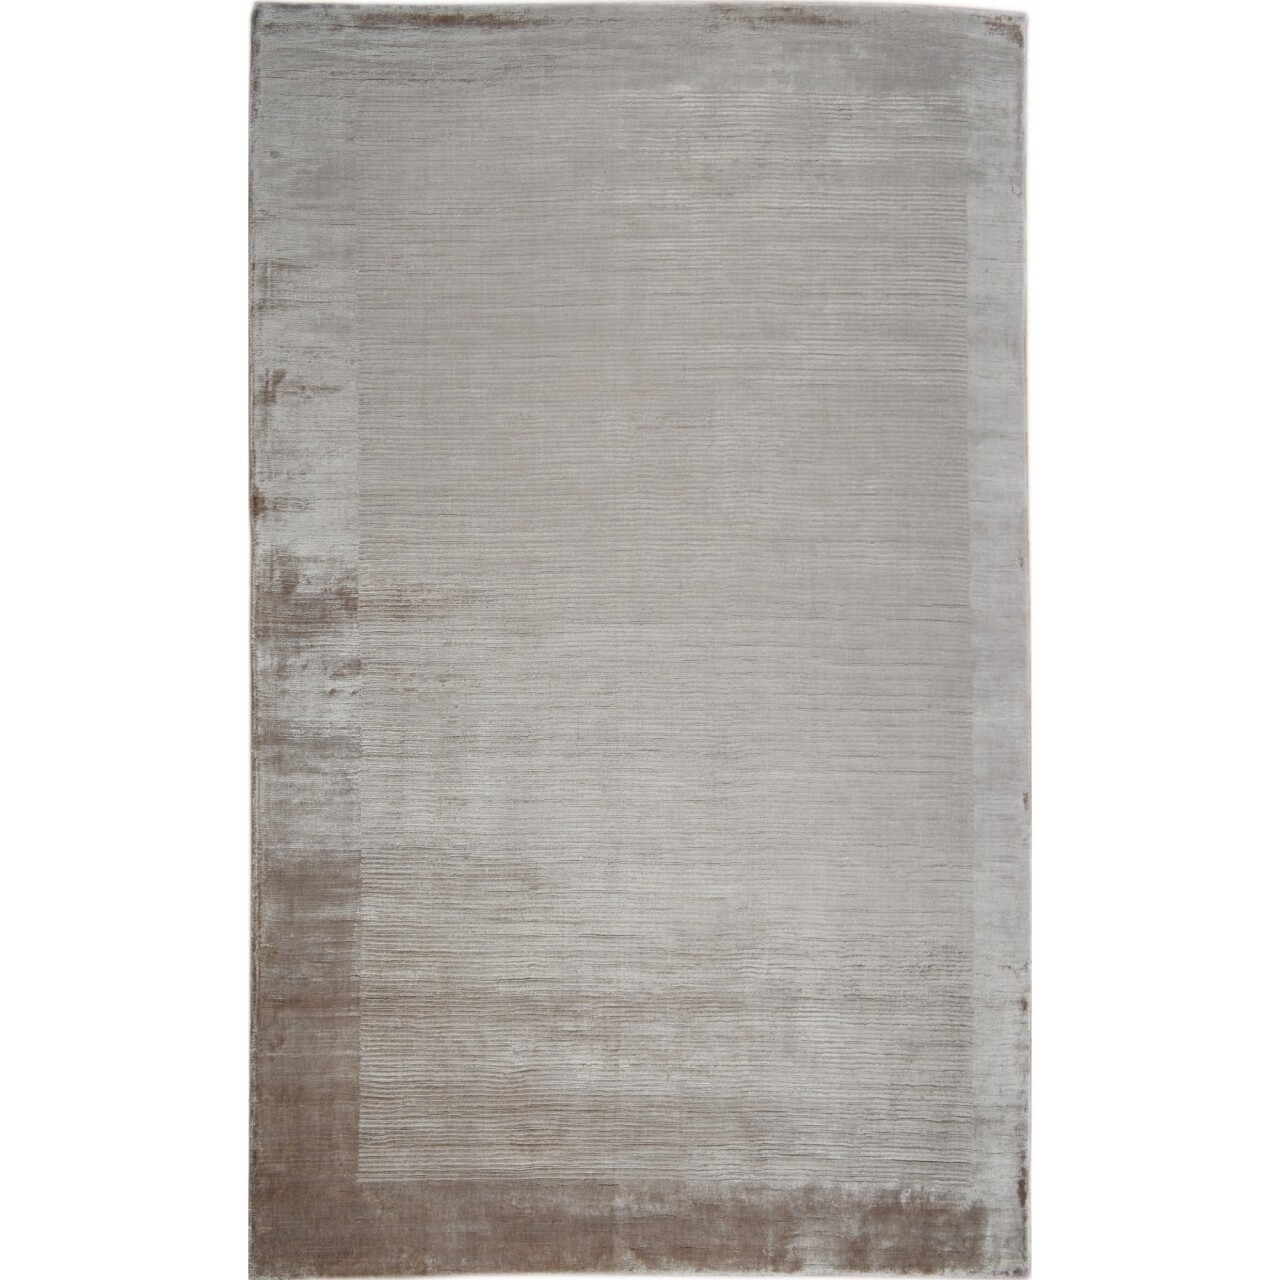 Covor rezistent Alya 3300 - Dark Mink, 80x300 cm